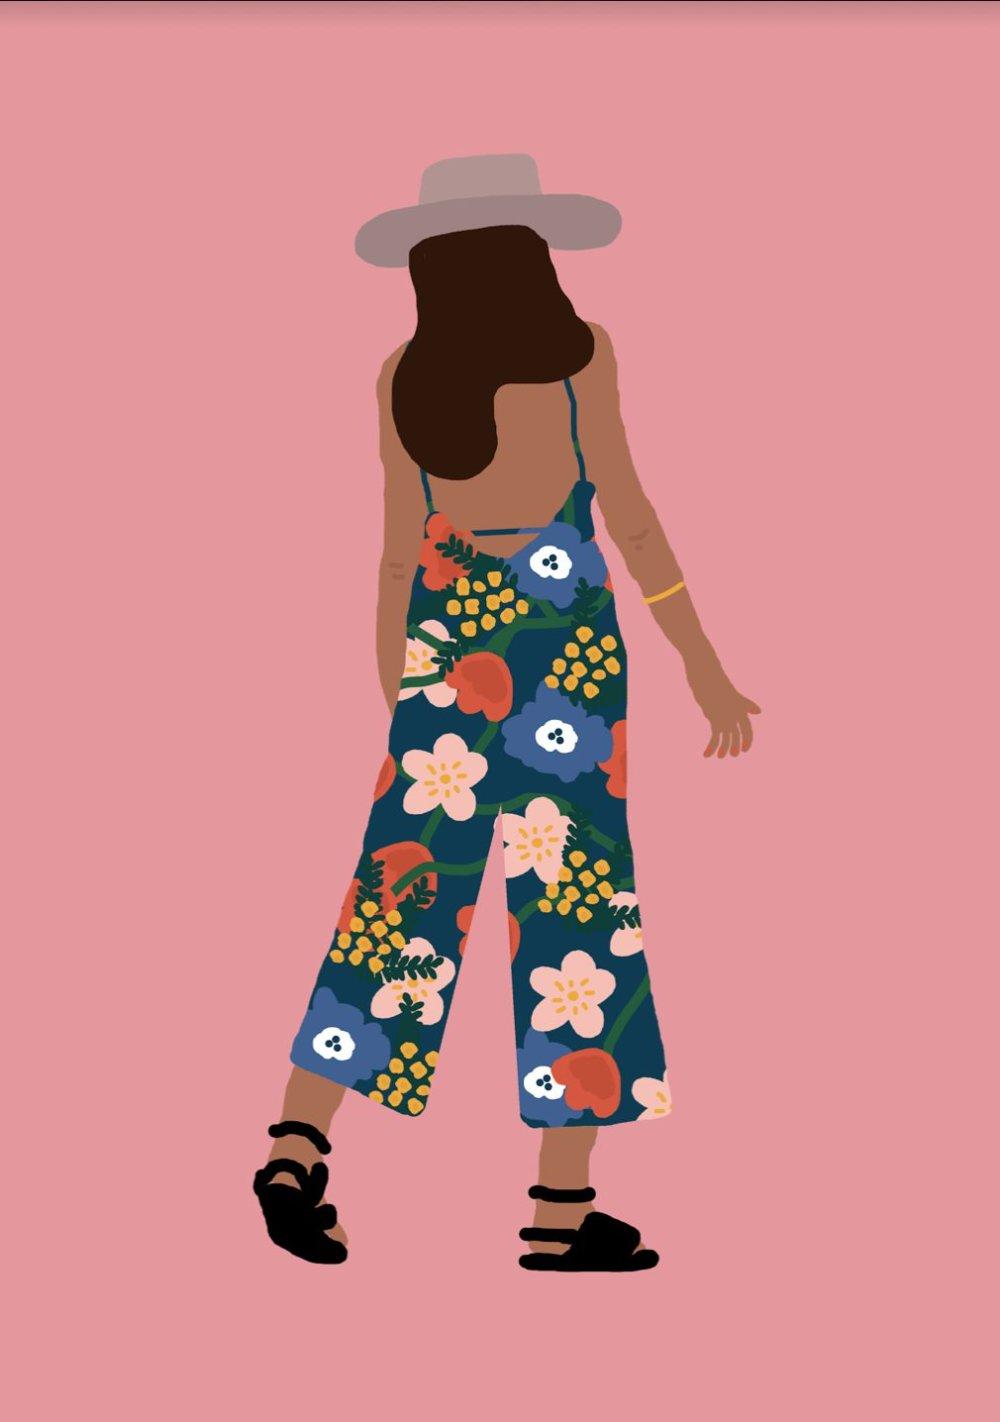 Gorgeous And Colorful Floral Illustrations By Rafaela Mascaro 5